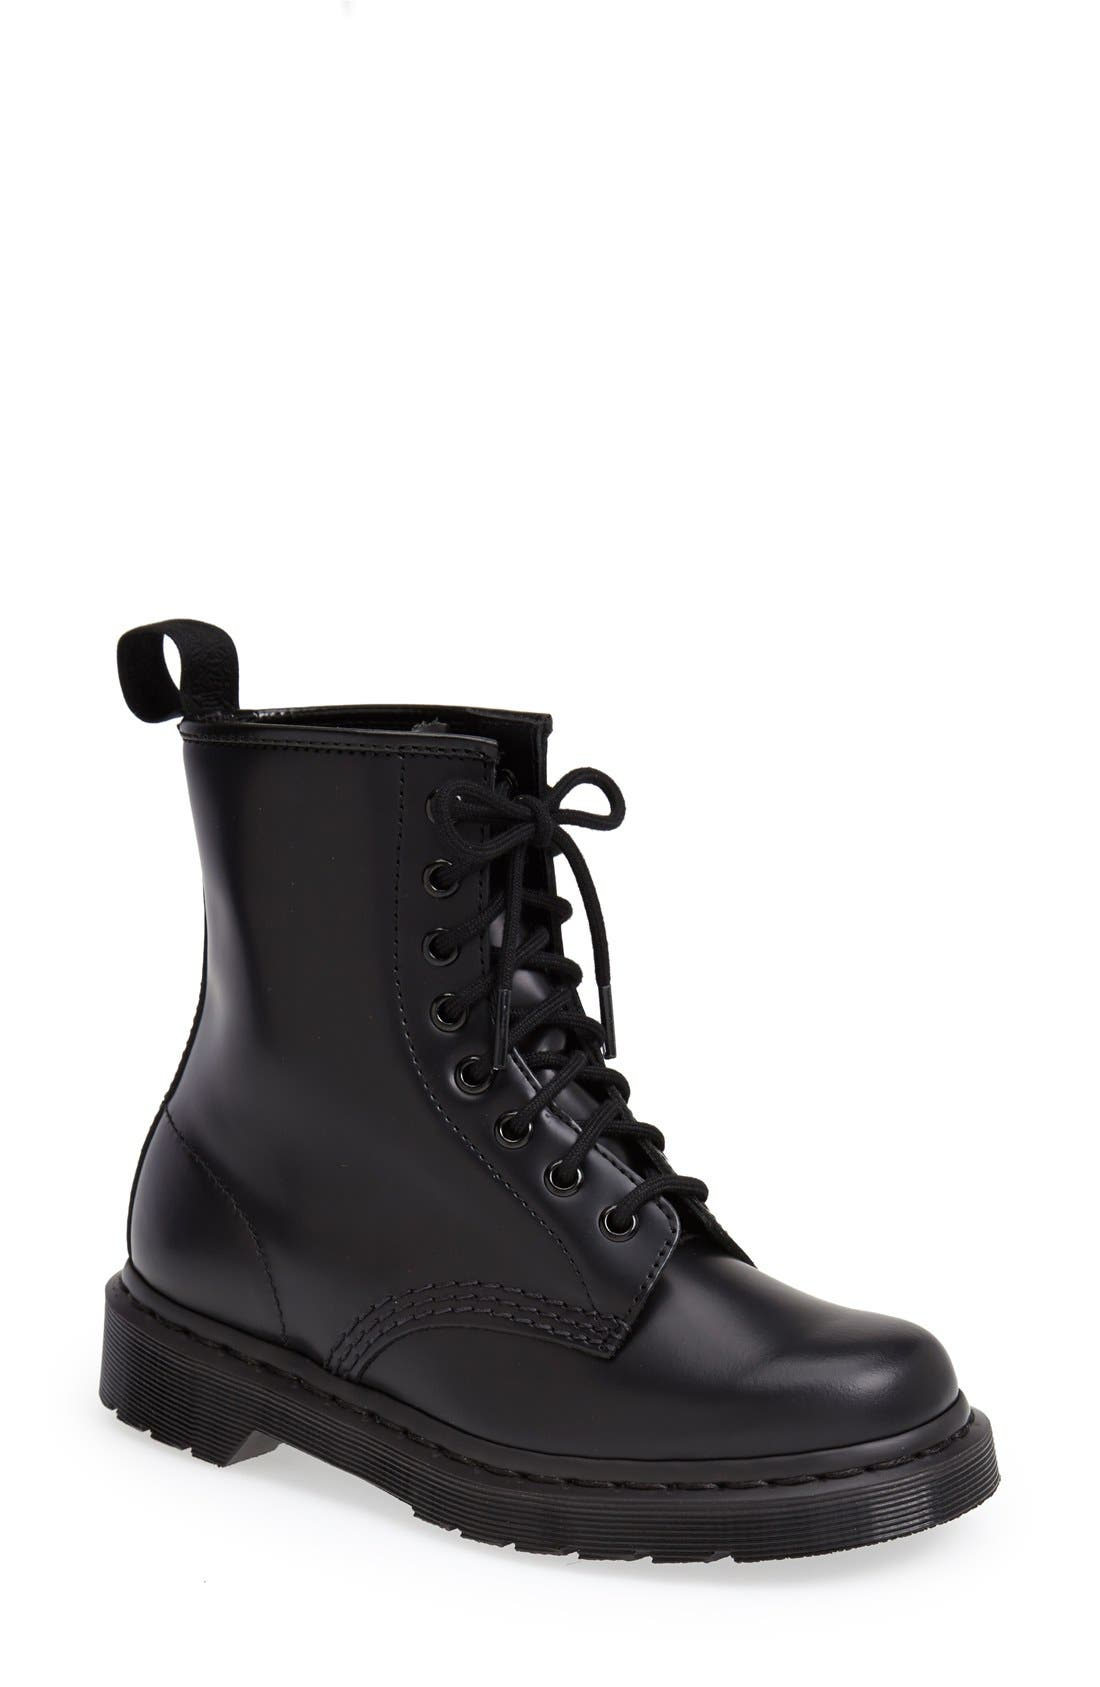 Main Image - Dr. Martens '1460 Mono' Boot (Women)